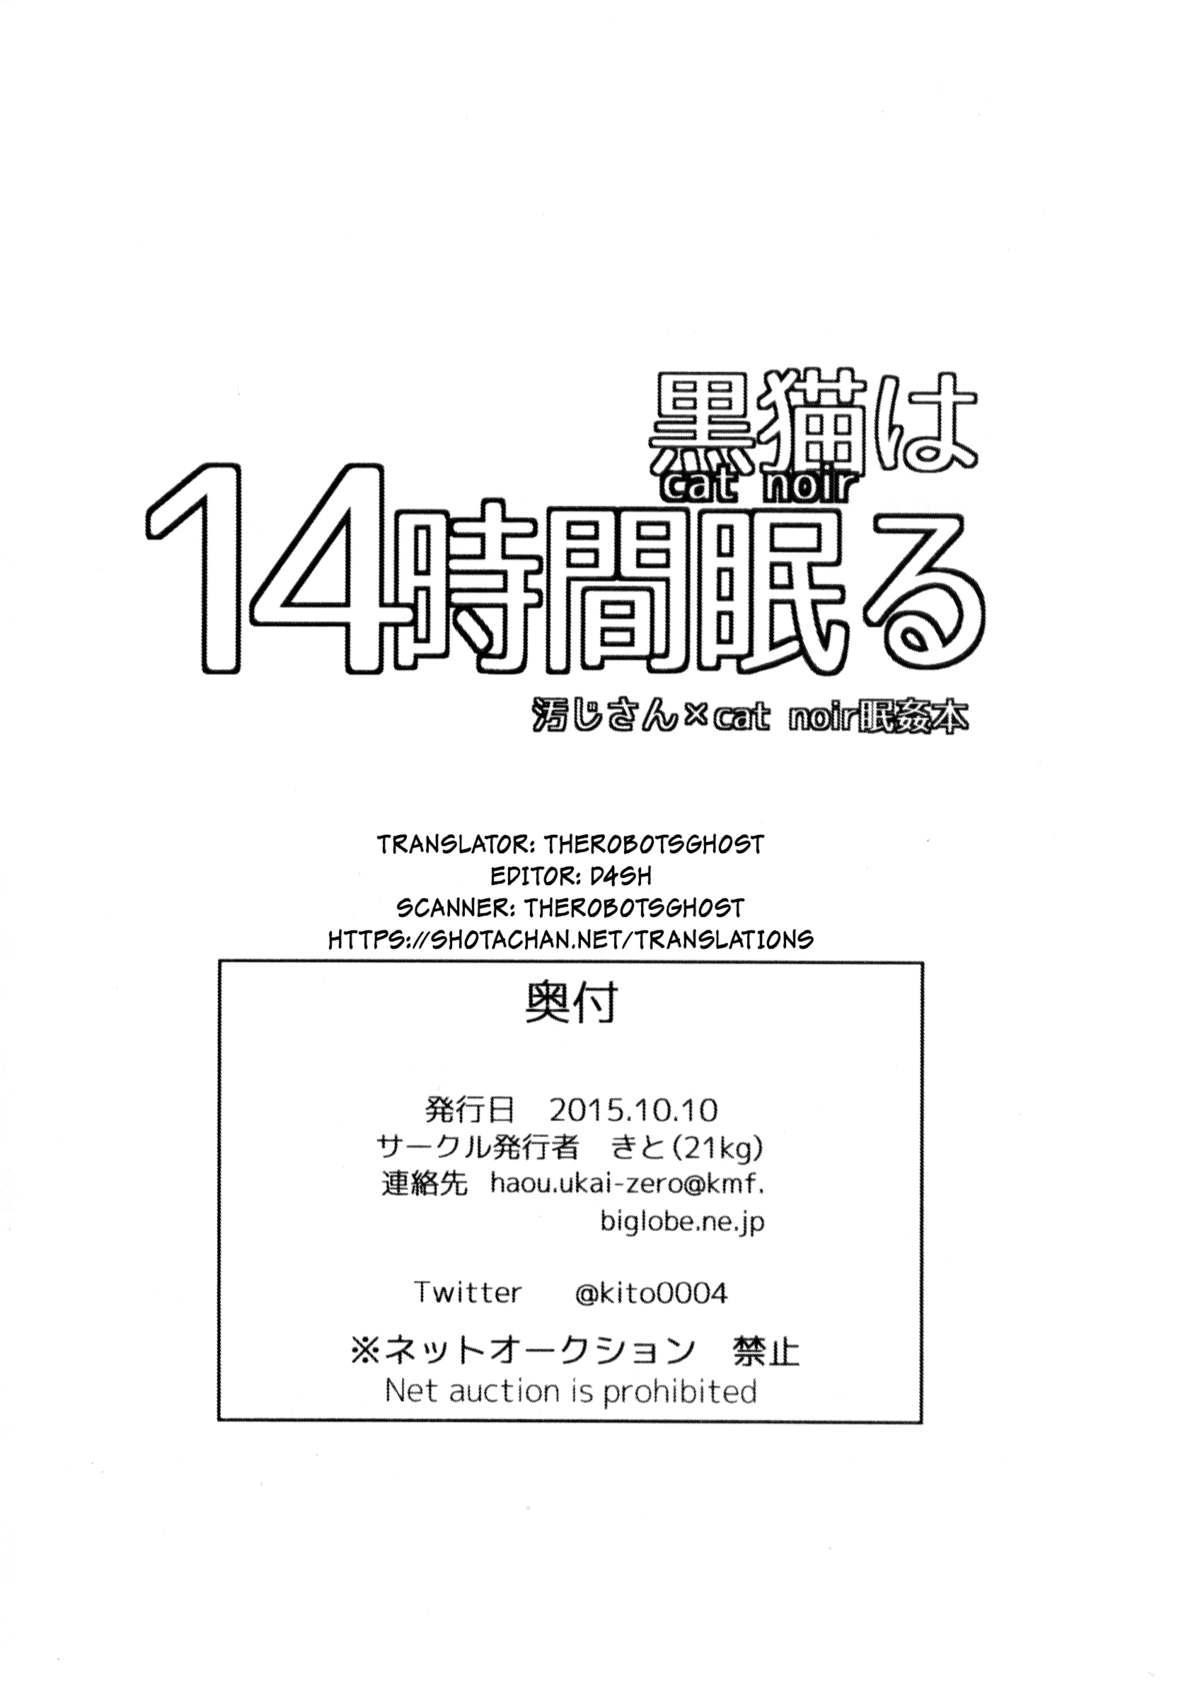 Cat Noir wa 14-jikan Nemuru 7